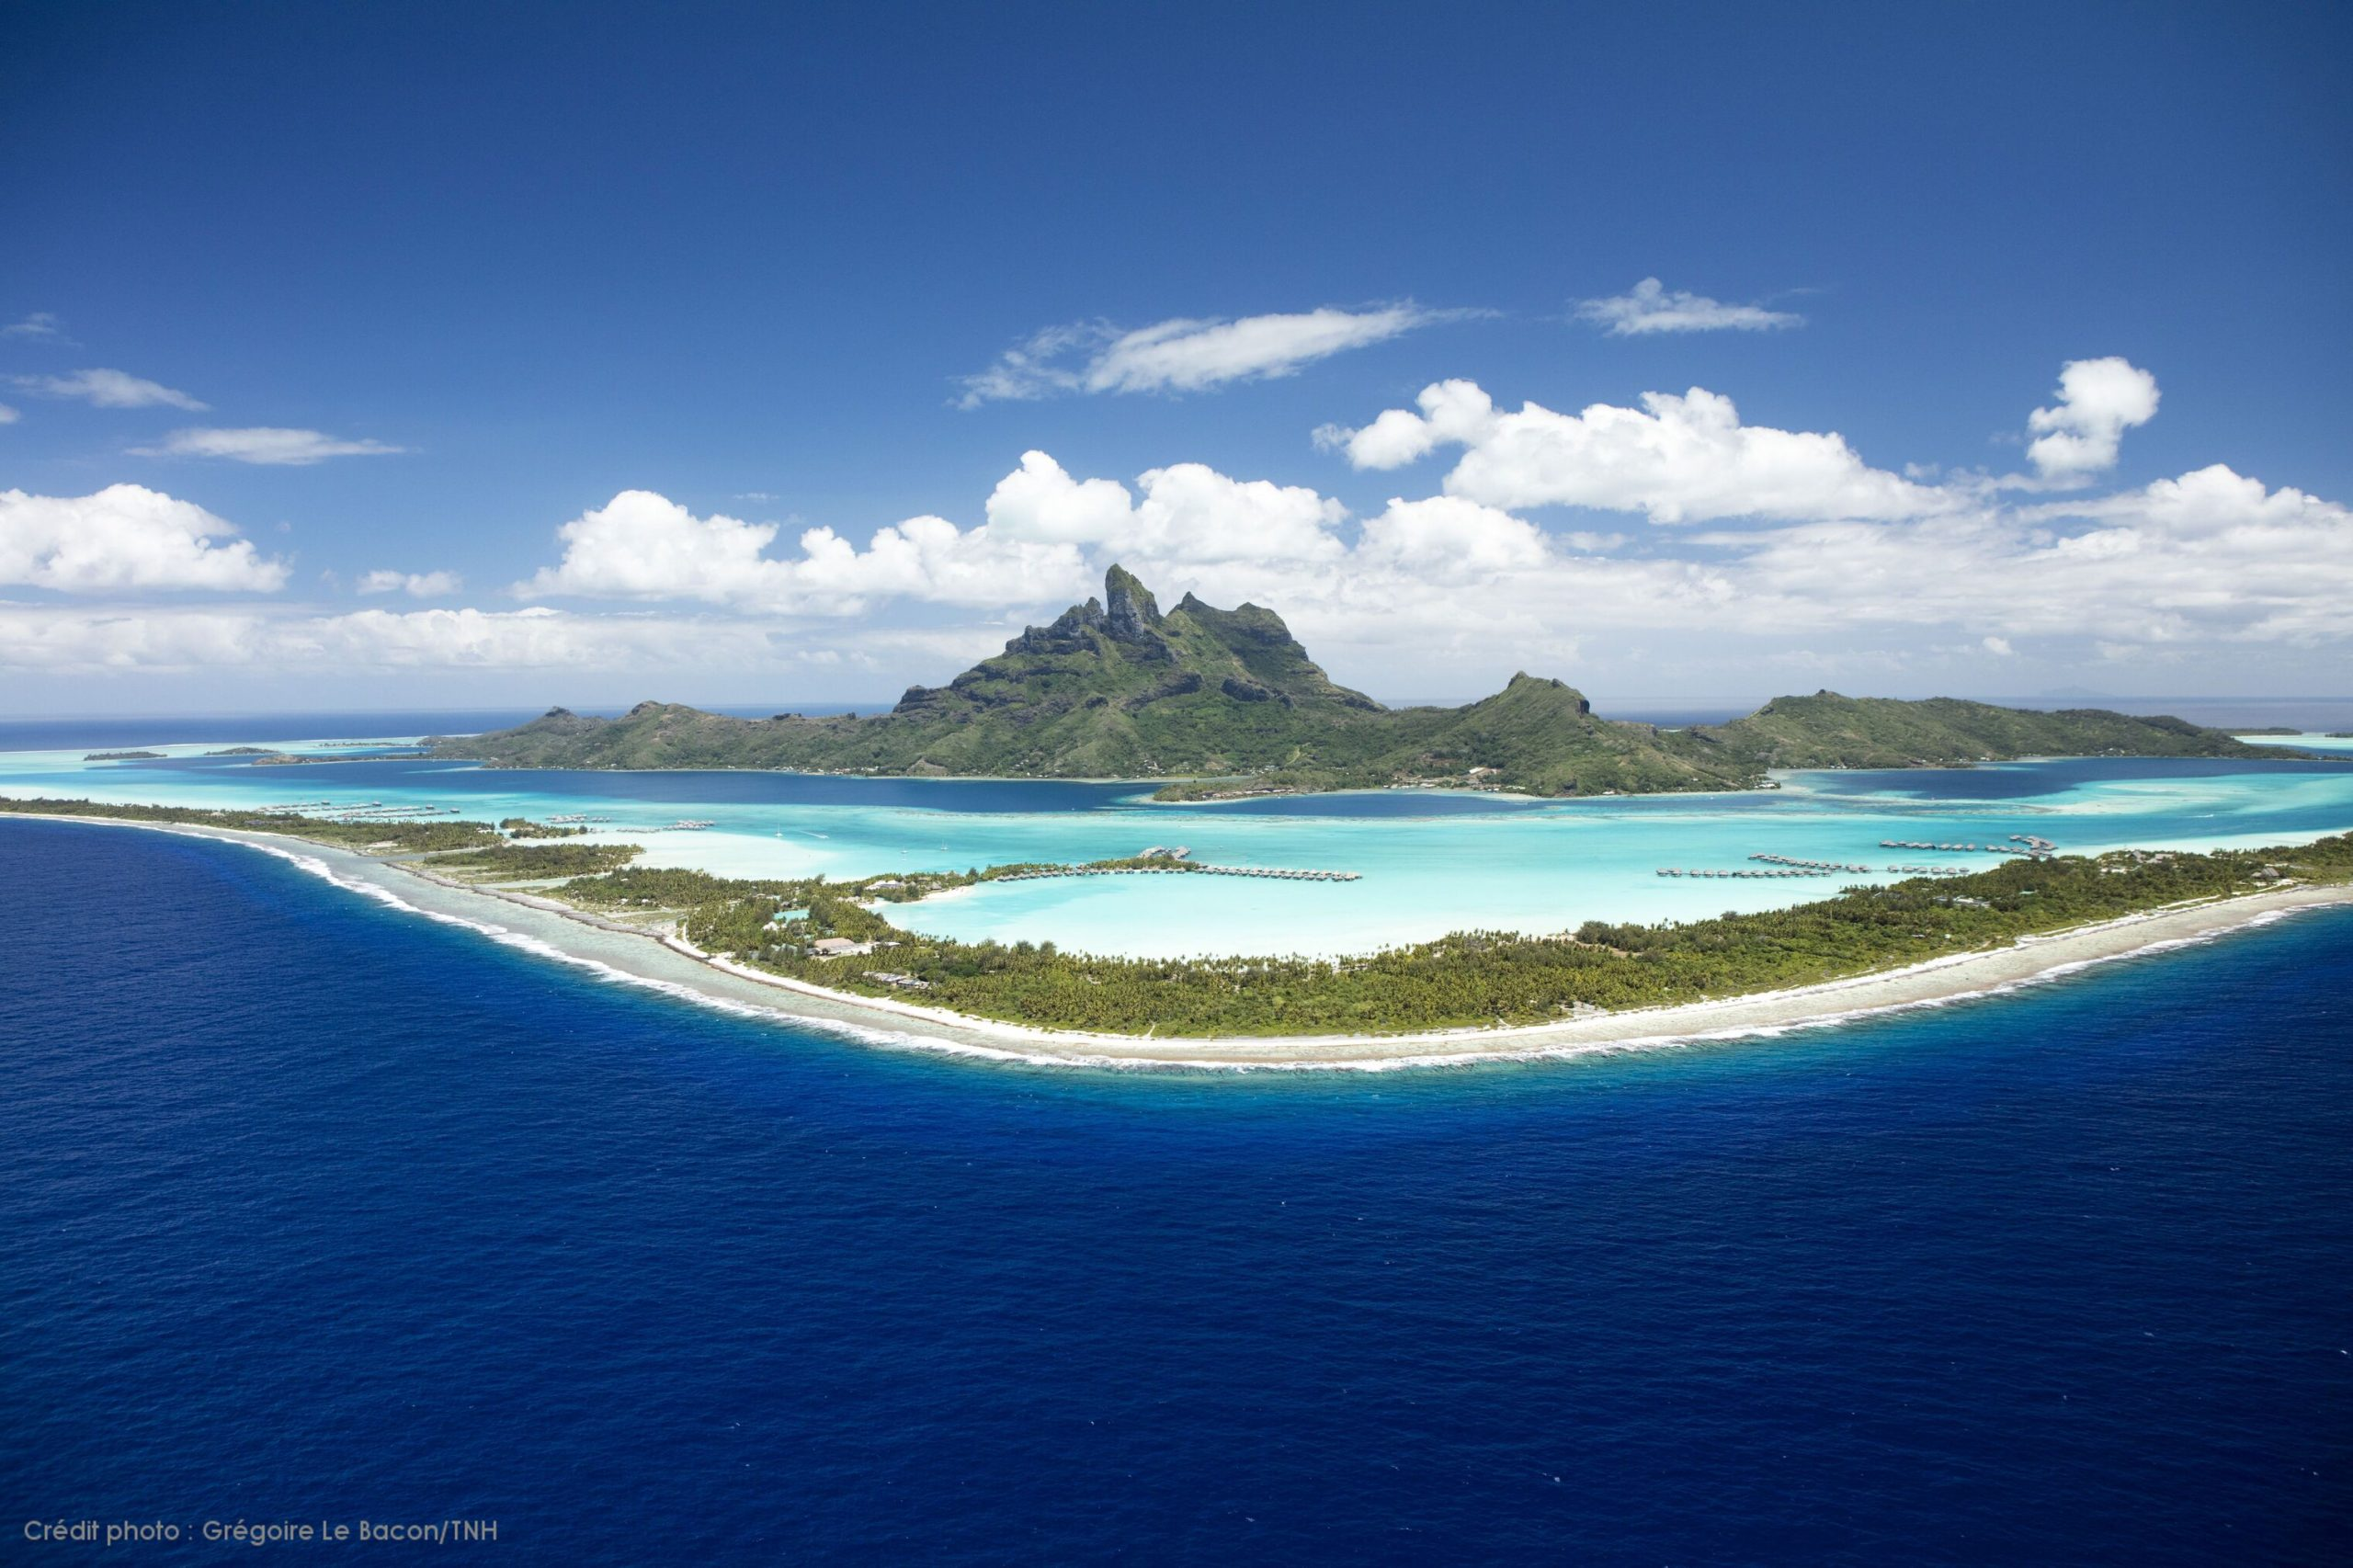 https://tahititourisme.uk/wp-content/uploads/2021/06/P2_08_BORA-BORA_Bora-Bora-2-©-Grégoire-Le-Bacon-Tahiti-Nui-Helicopters-1-scaled.jpg